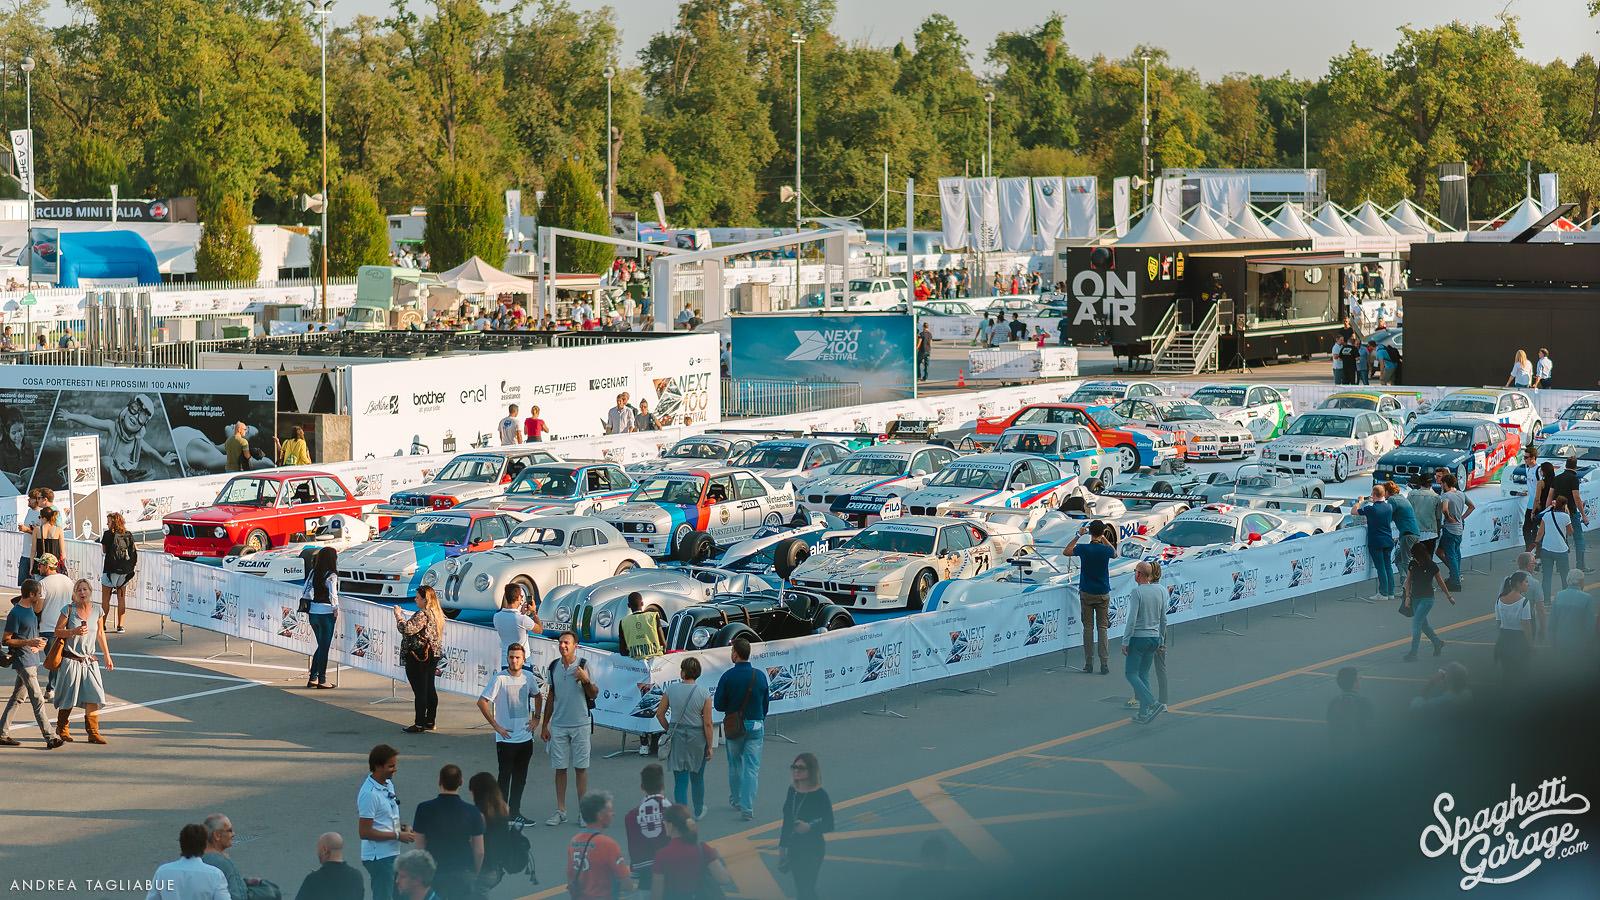 A century of Bavarian Motor Works: BMW Next 100 Autodromo di Monza